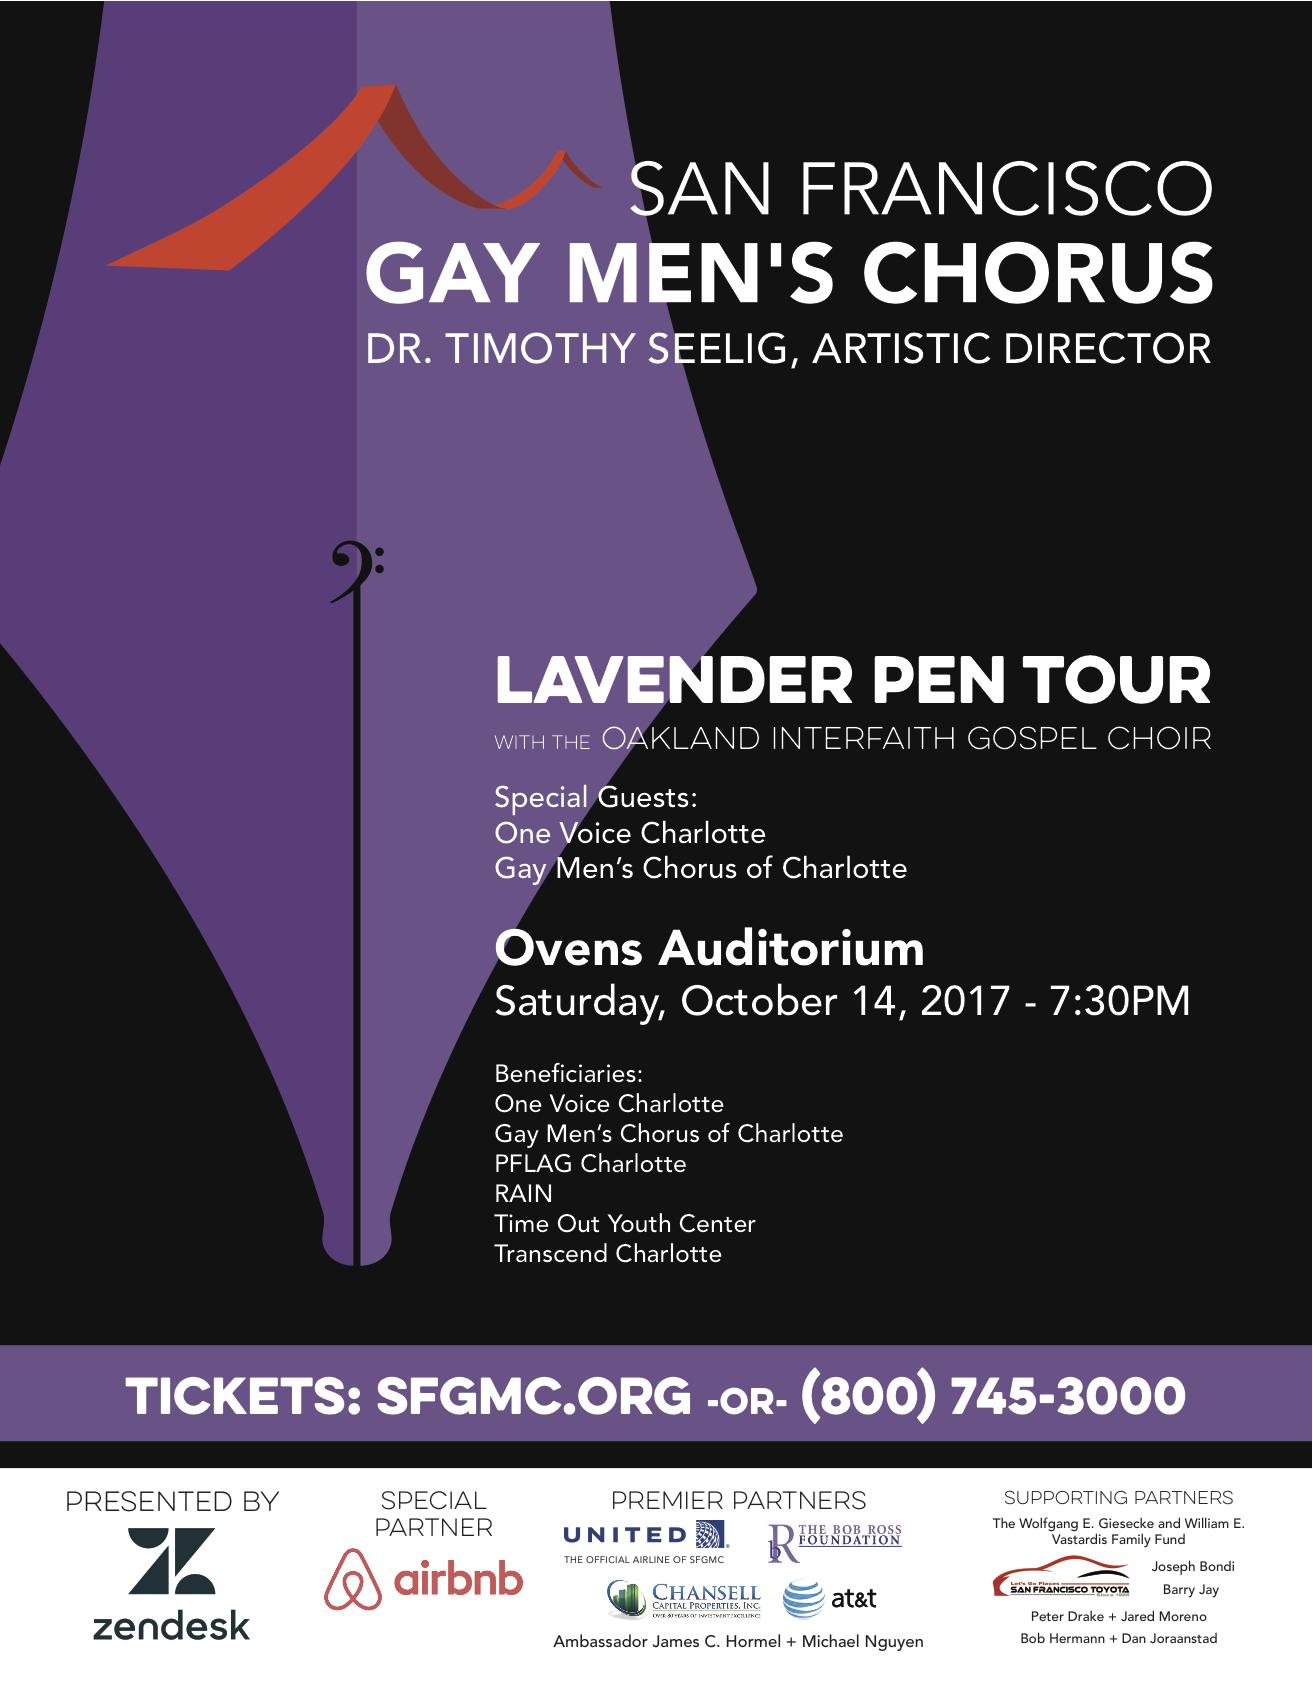 Lavender Pen Tour Flyer jpg